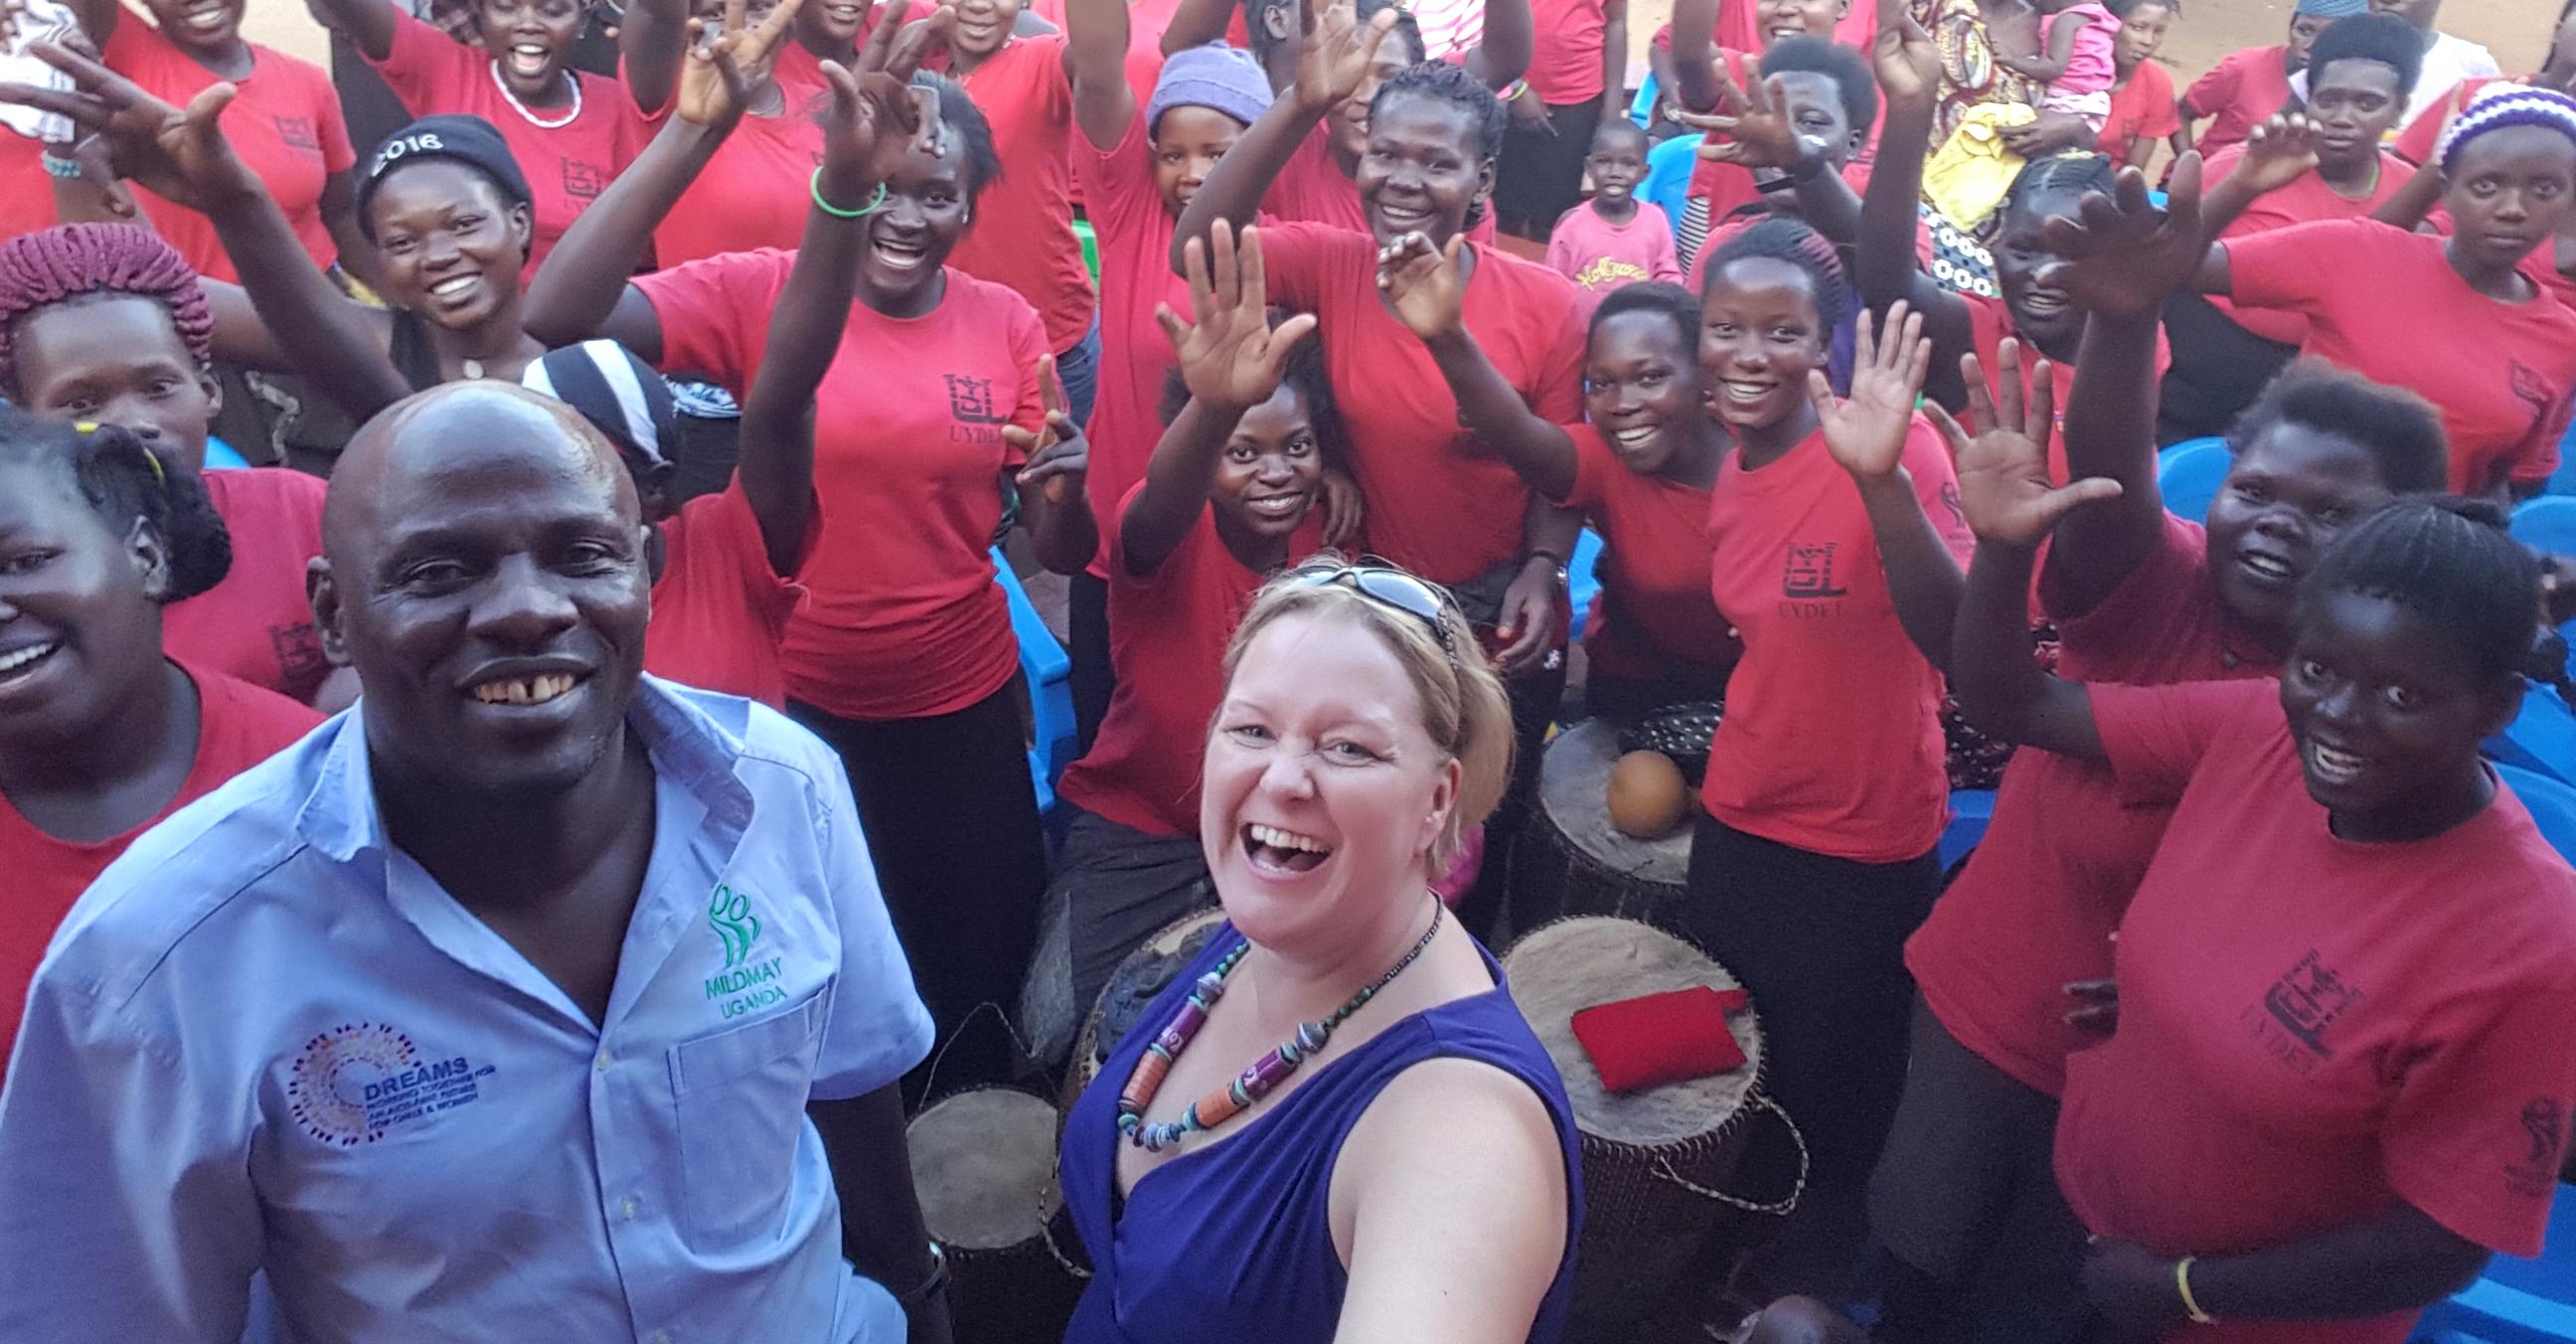 africa sub saharan fulbright scholar program